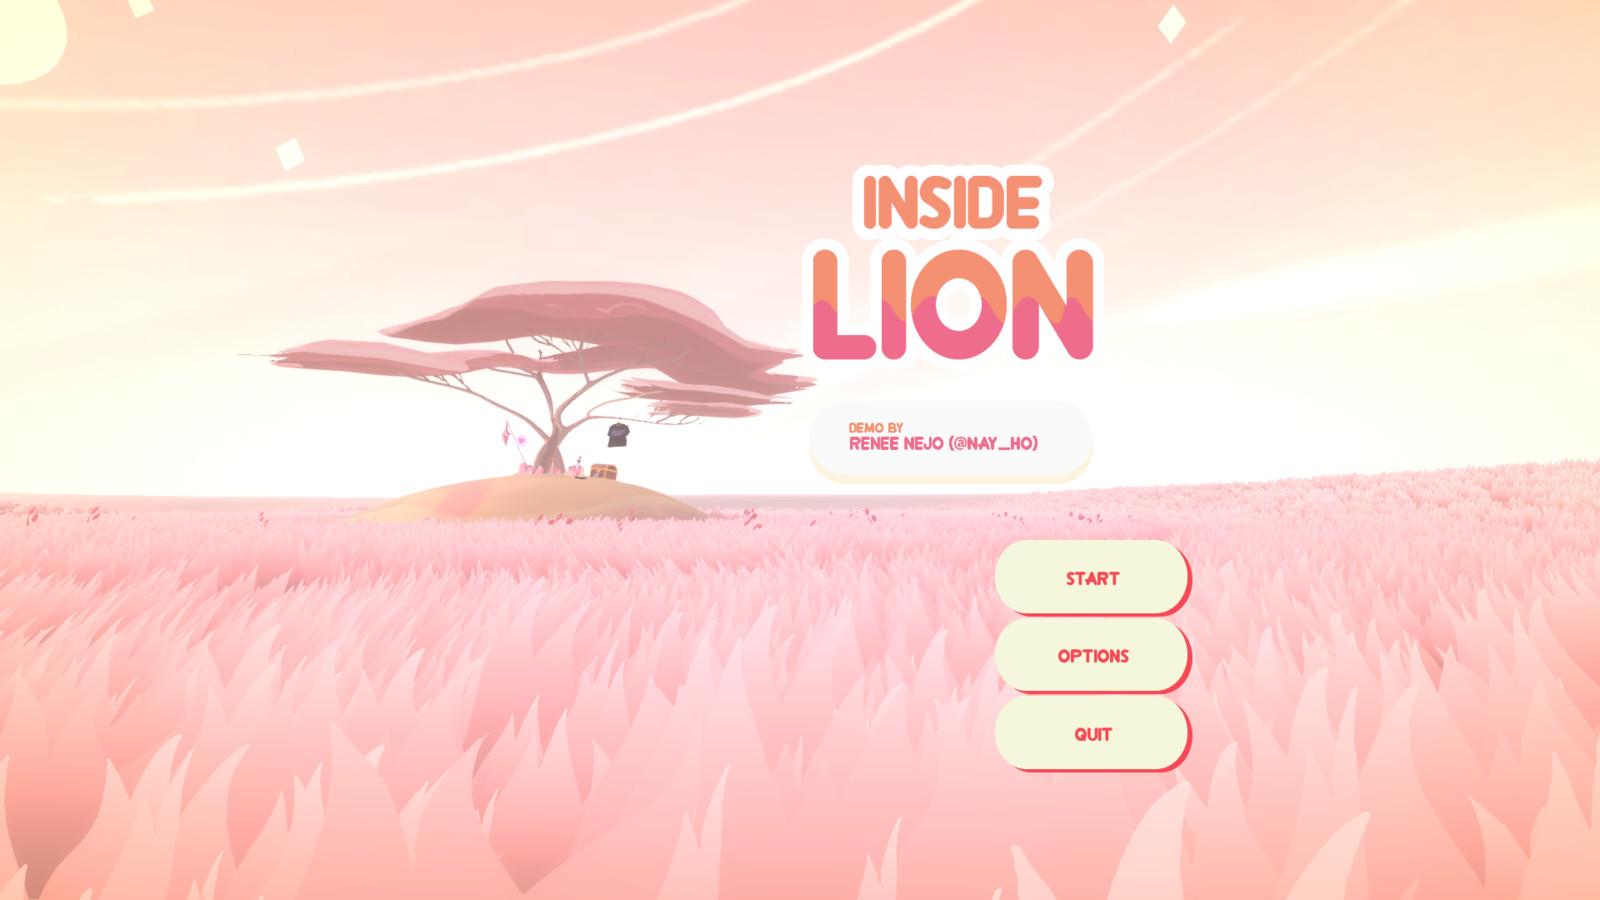 Inside Lion Demo